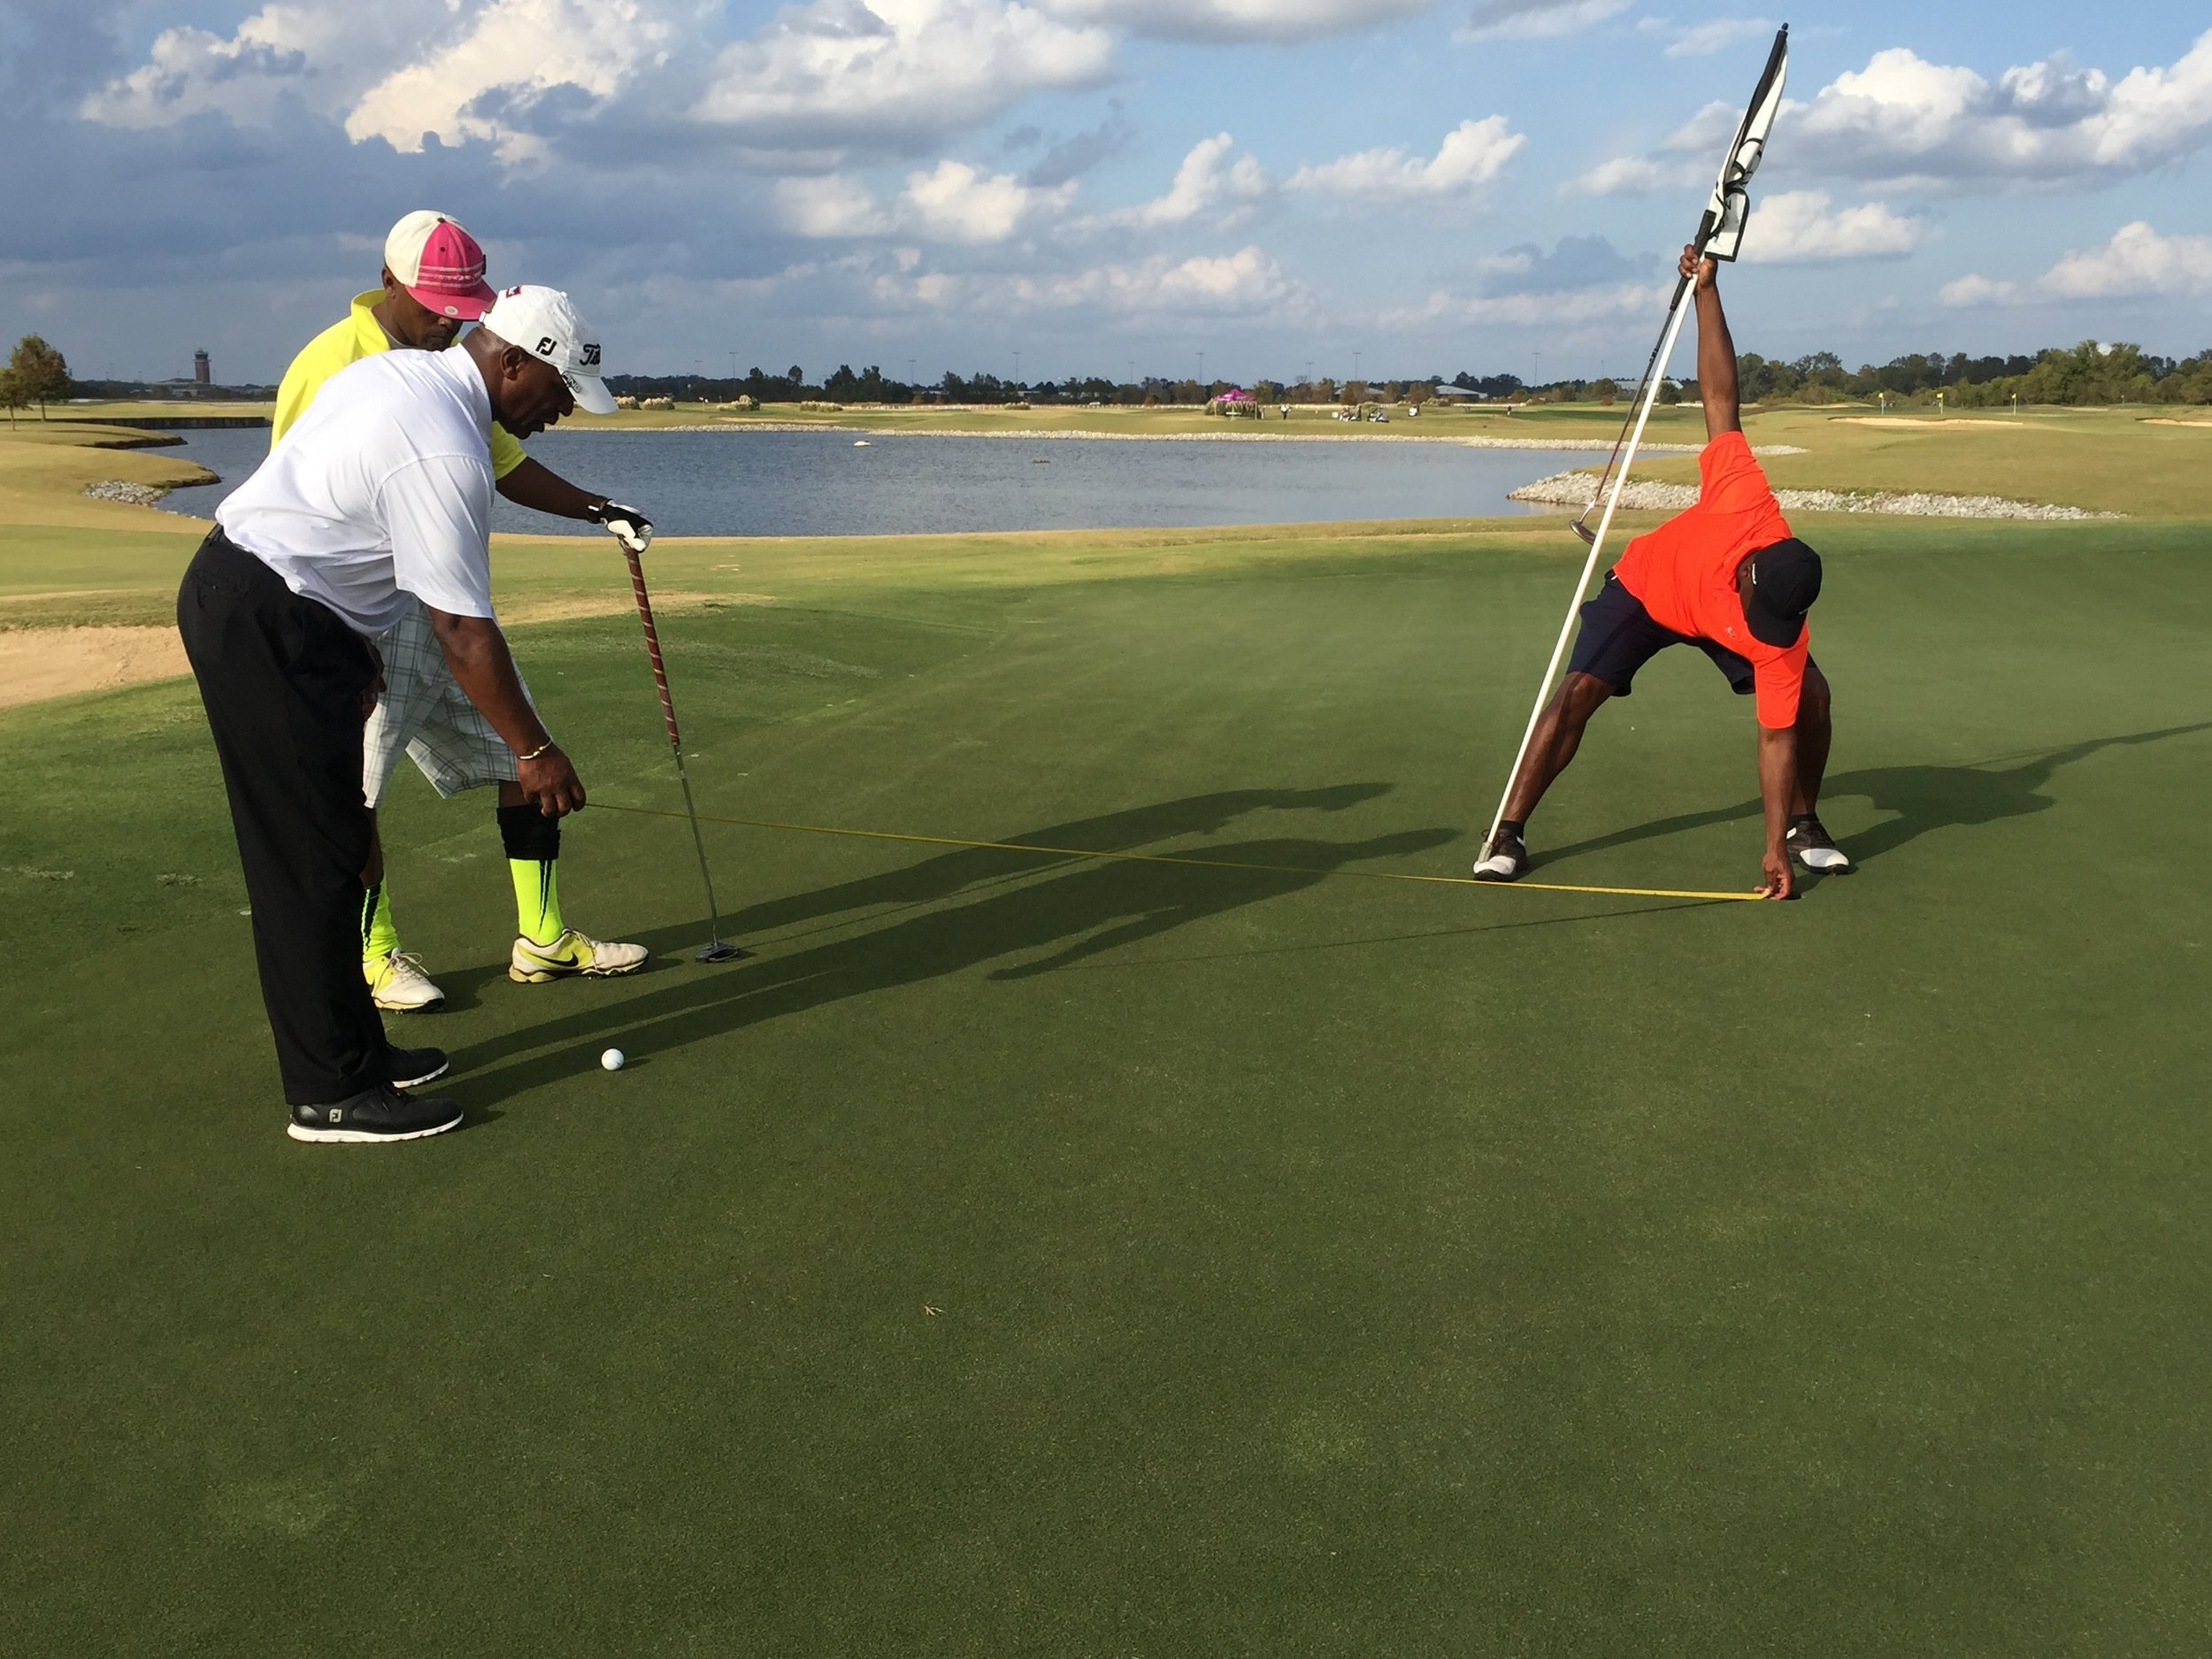 Golf Tourn.jpg